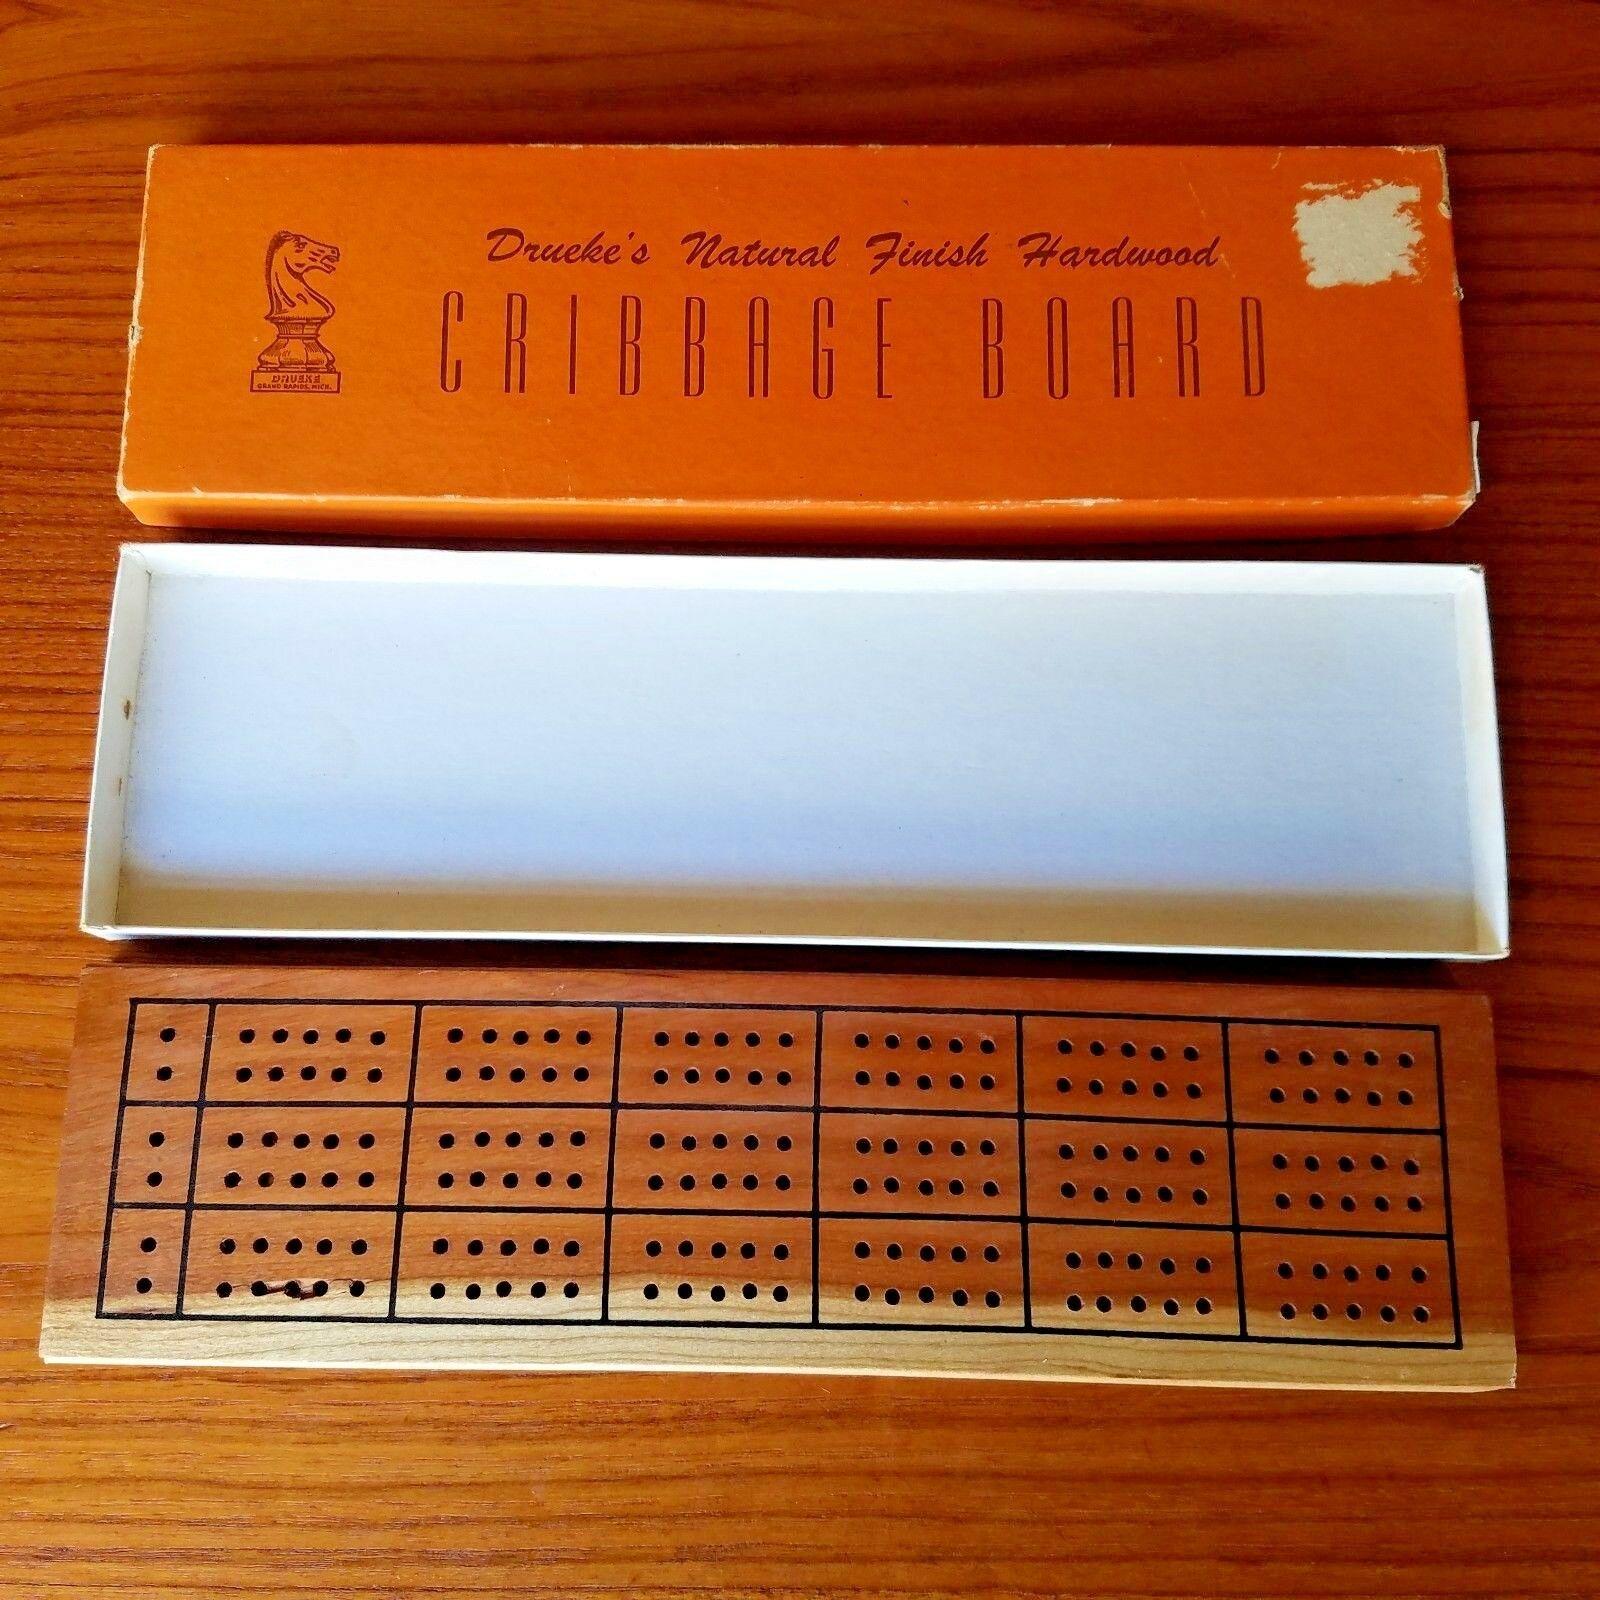 Vintage Drueke's Natural Finish Hardwood Cribbage Board #2050 In Box w Pegs - $18.37